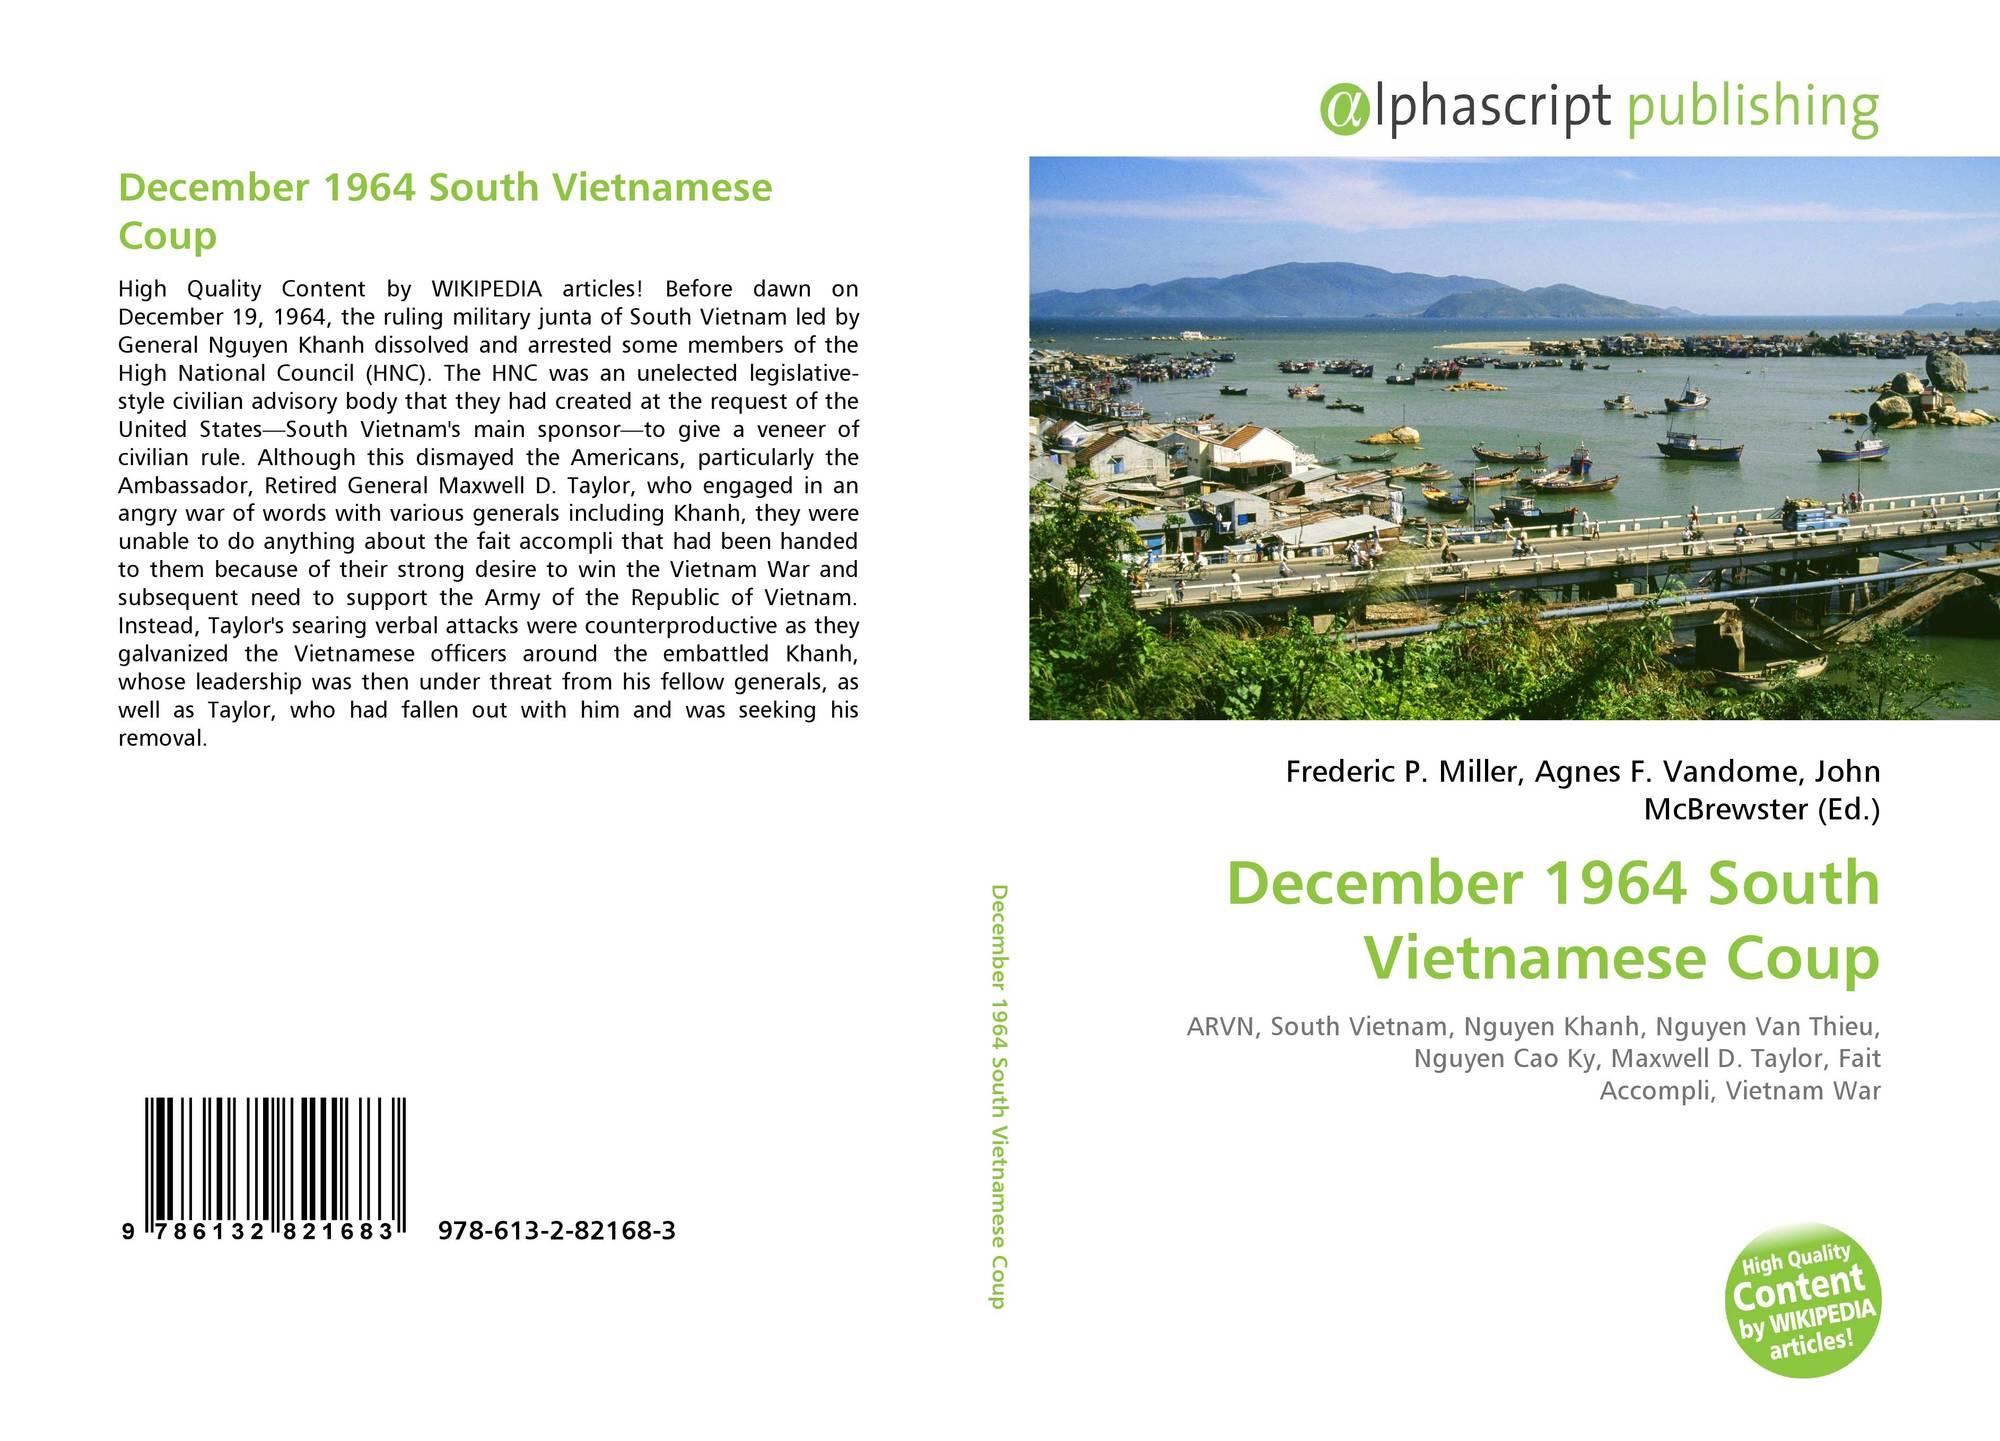 January 1964 South Vietnamese coup